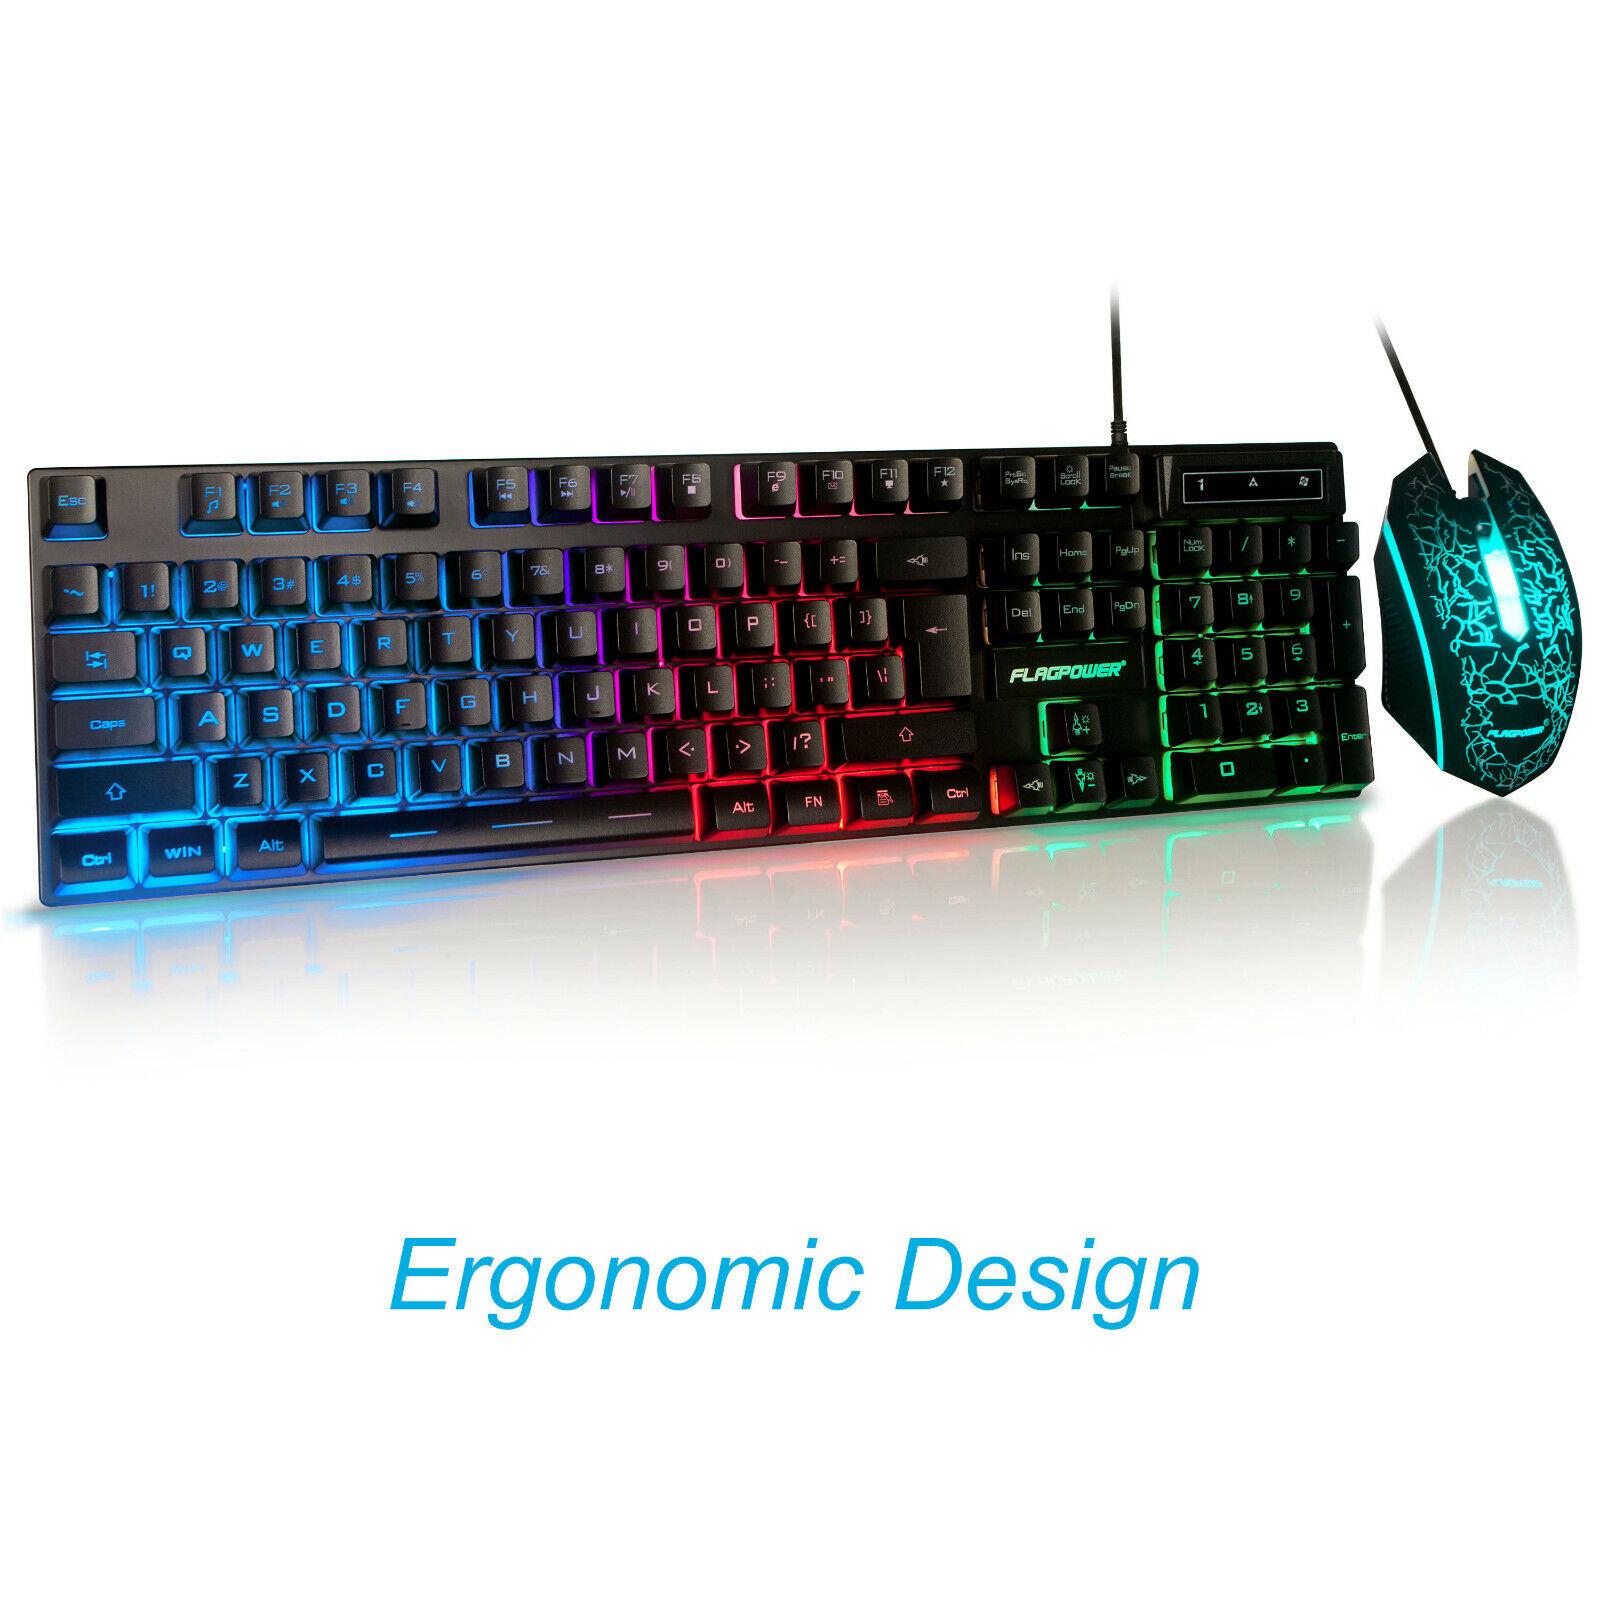 RGB Backlit Keyboard and Mouse Kit 3 Color Rainbow LED Illum